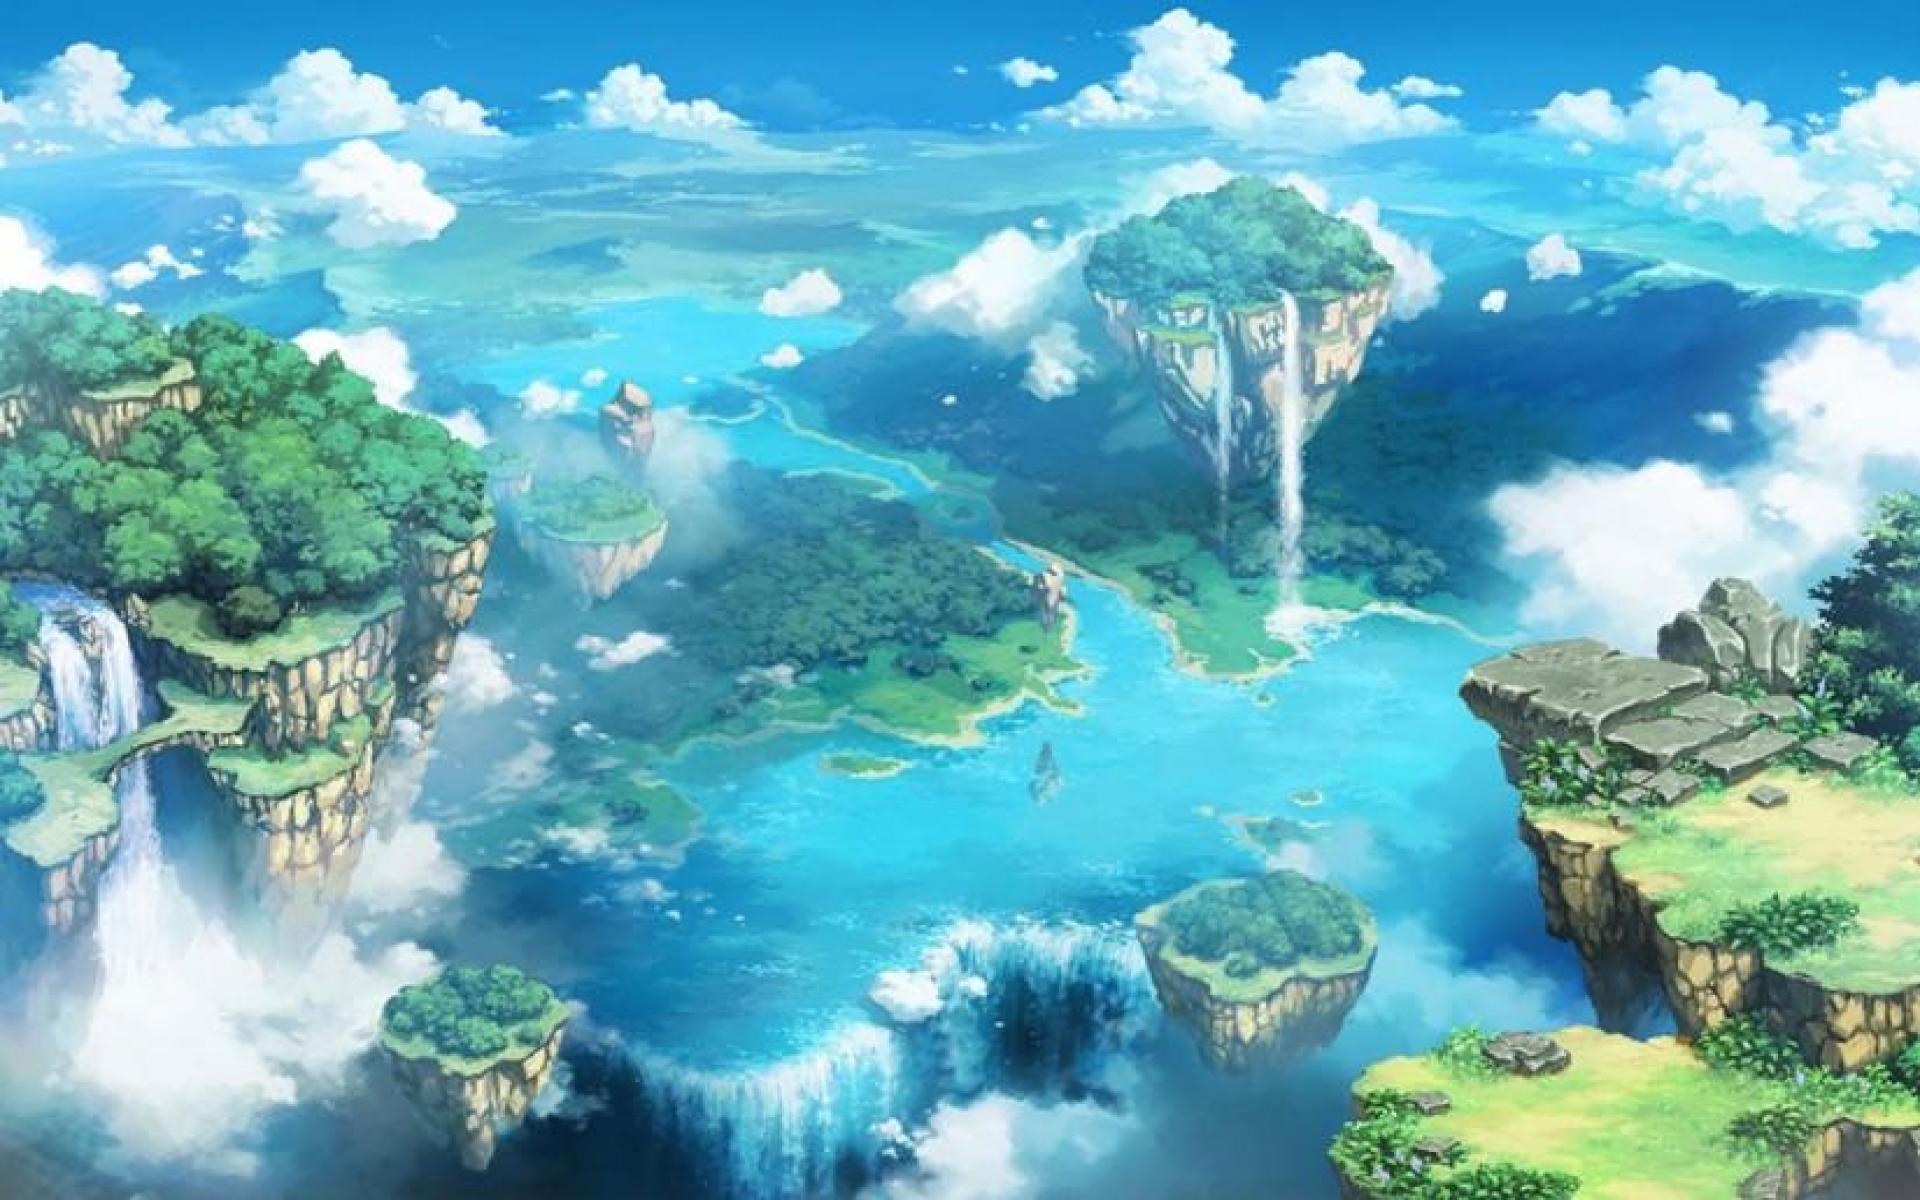 Anime Scenery Wallpaper - Desktop Background Anime Scenery - HD Wallpaper